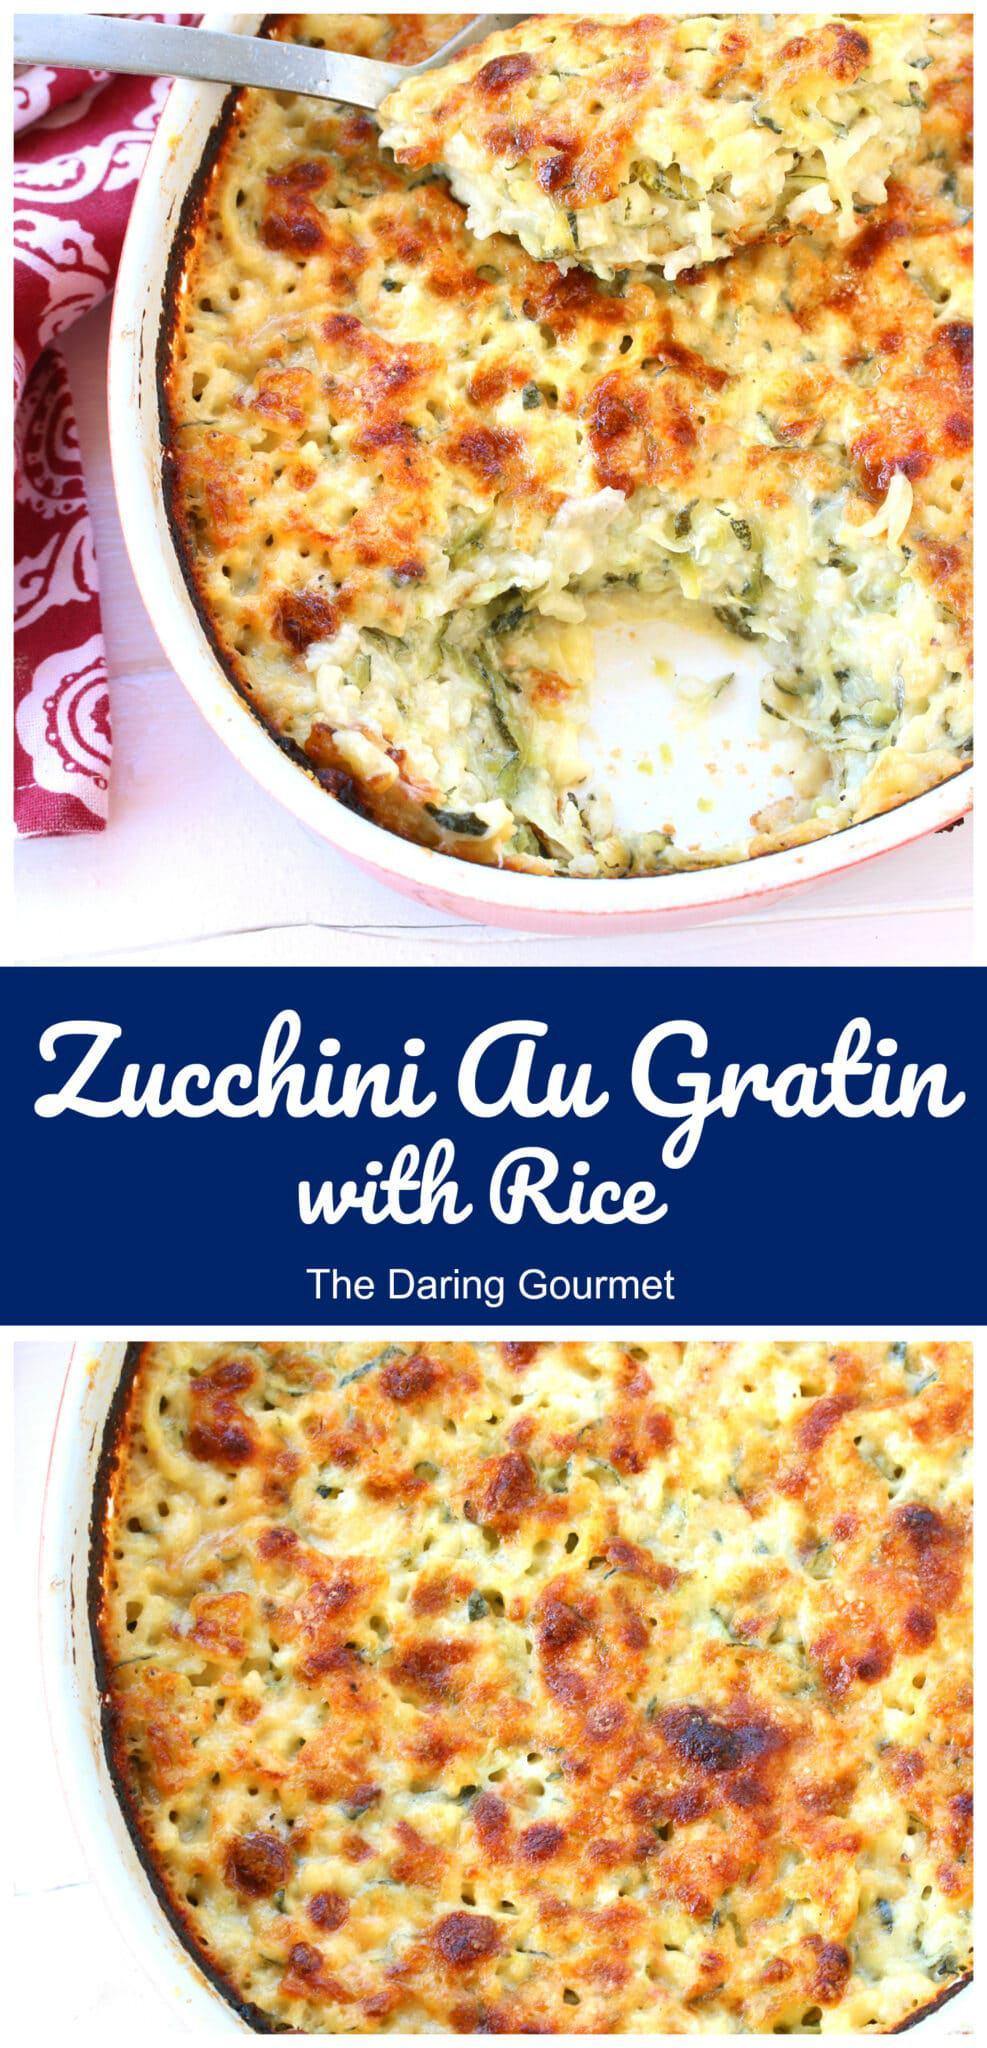 zucchini au gratin recipe french tian cheese rice courgette julia child